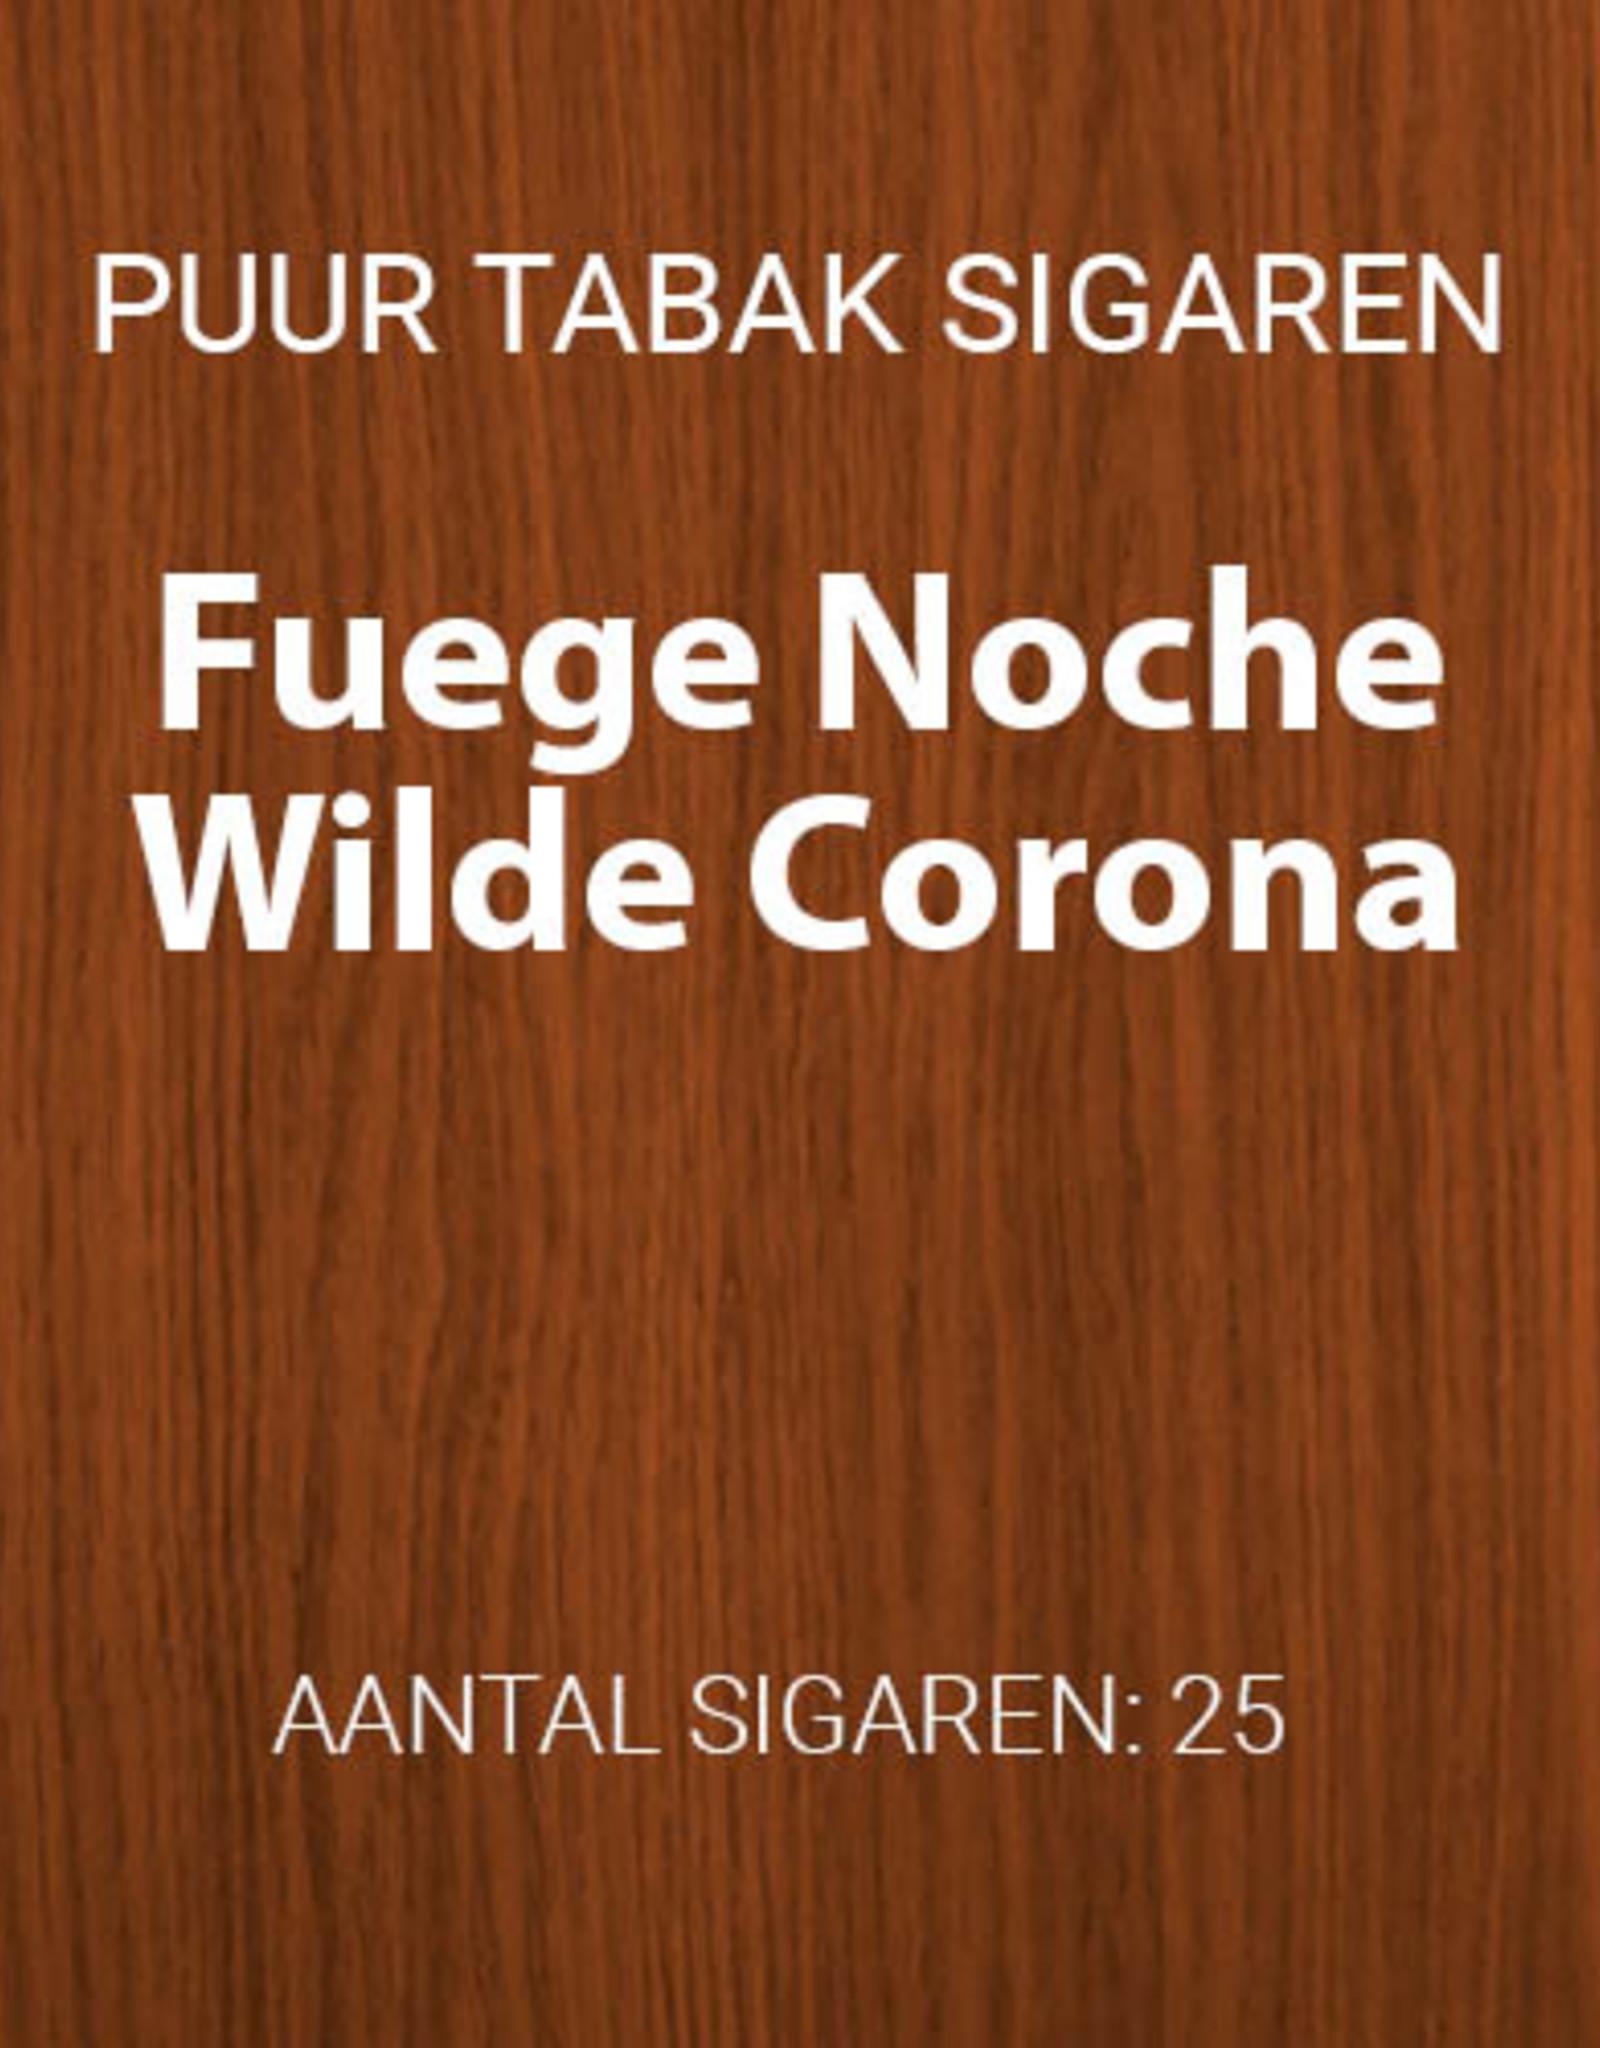 Fuege Noche Wilde Corona